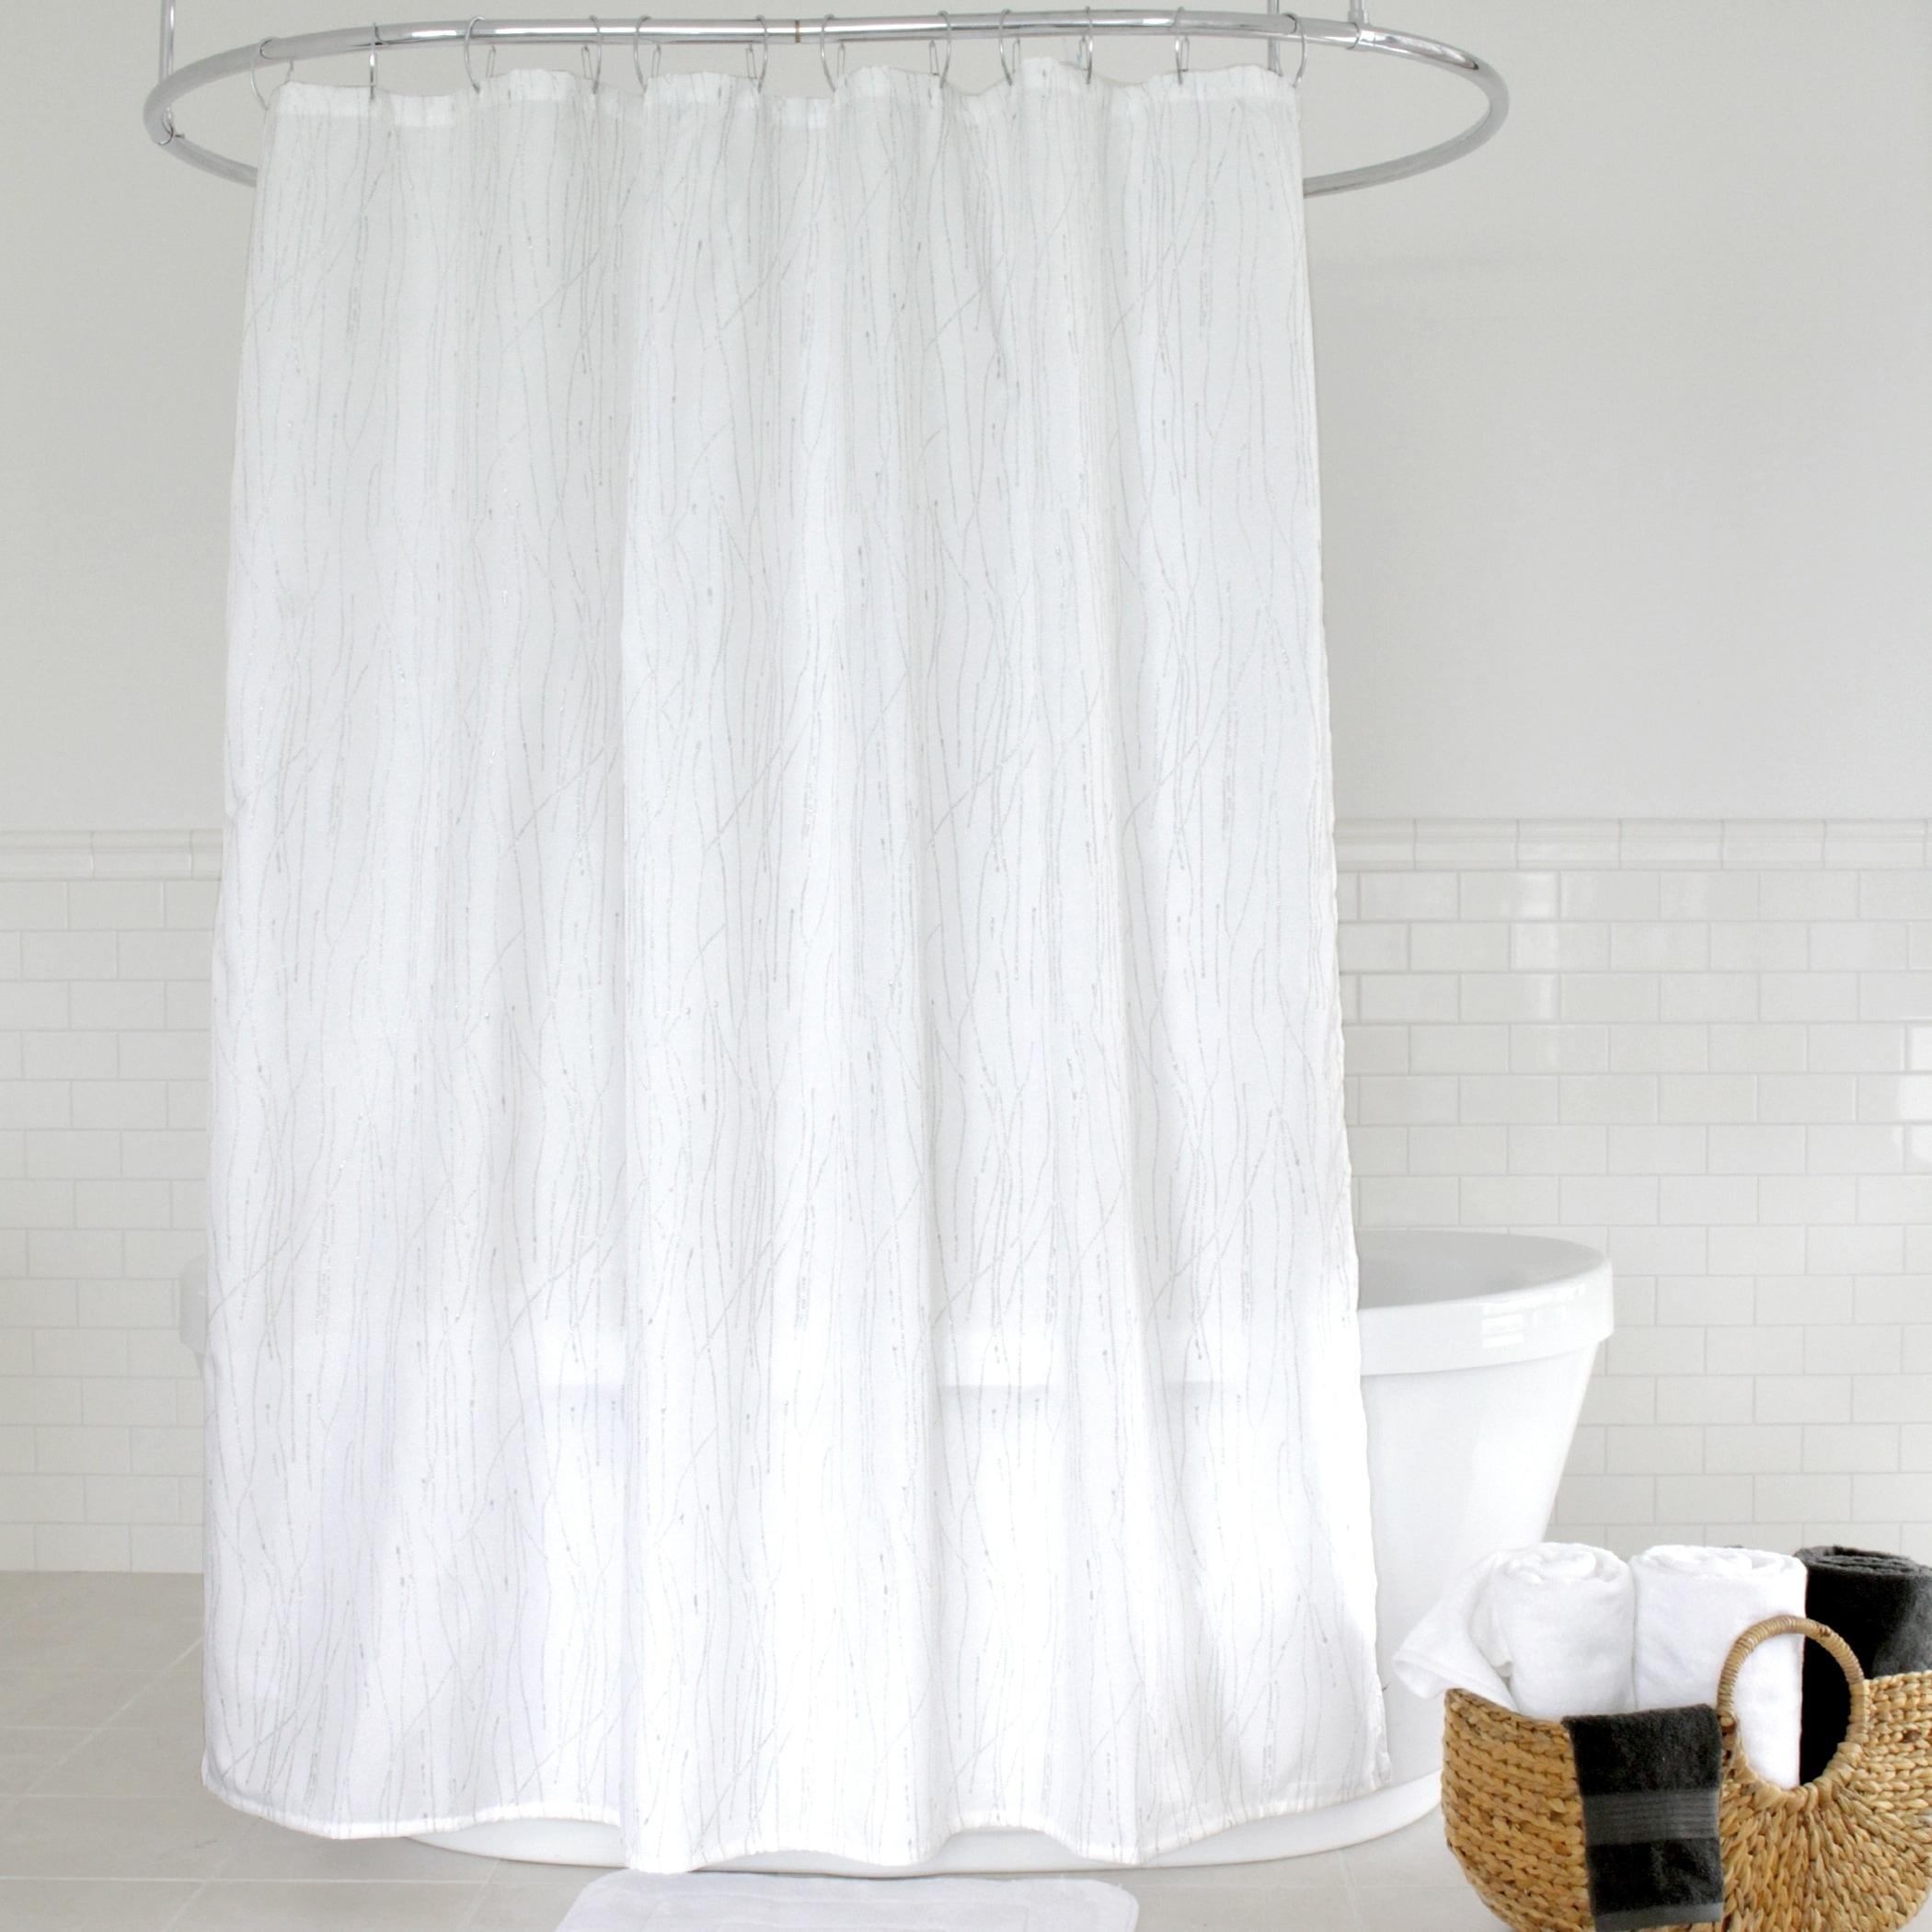 Shop Splash Home Alexa Polyester Fabric Shower Curtain 70 X 72 White Gold Overstock 23040346